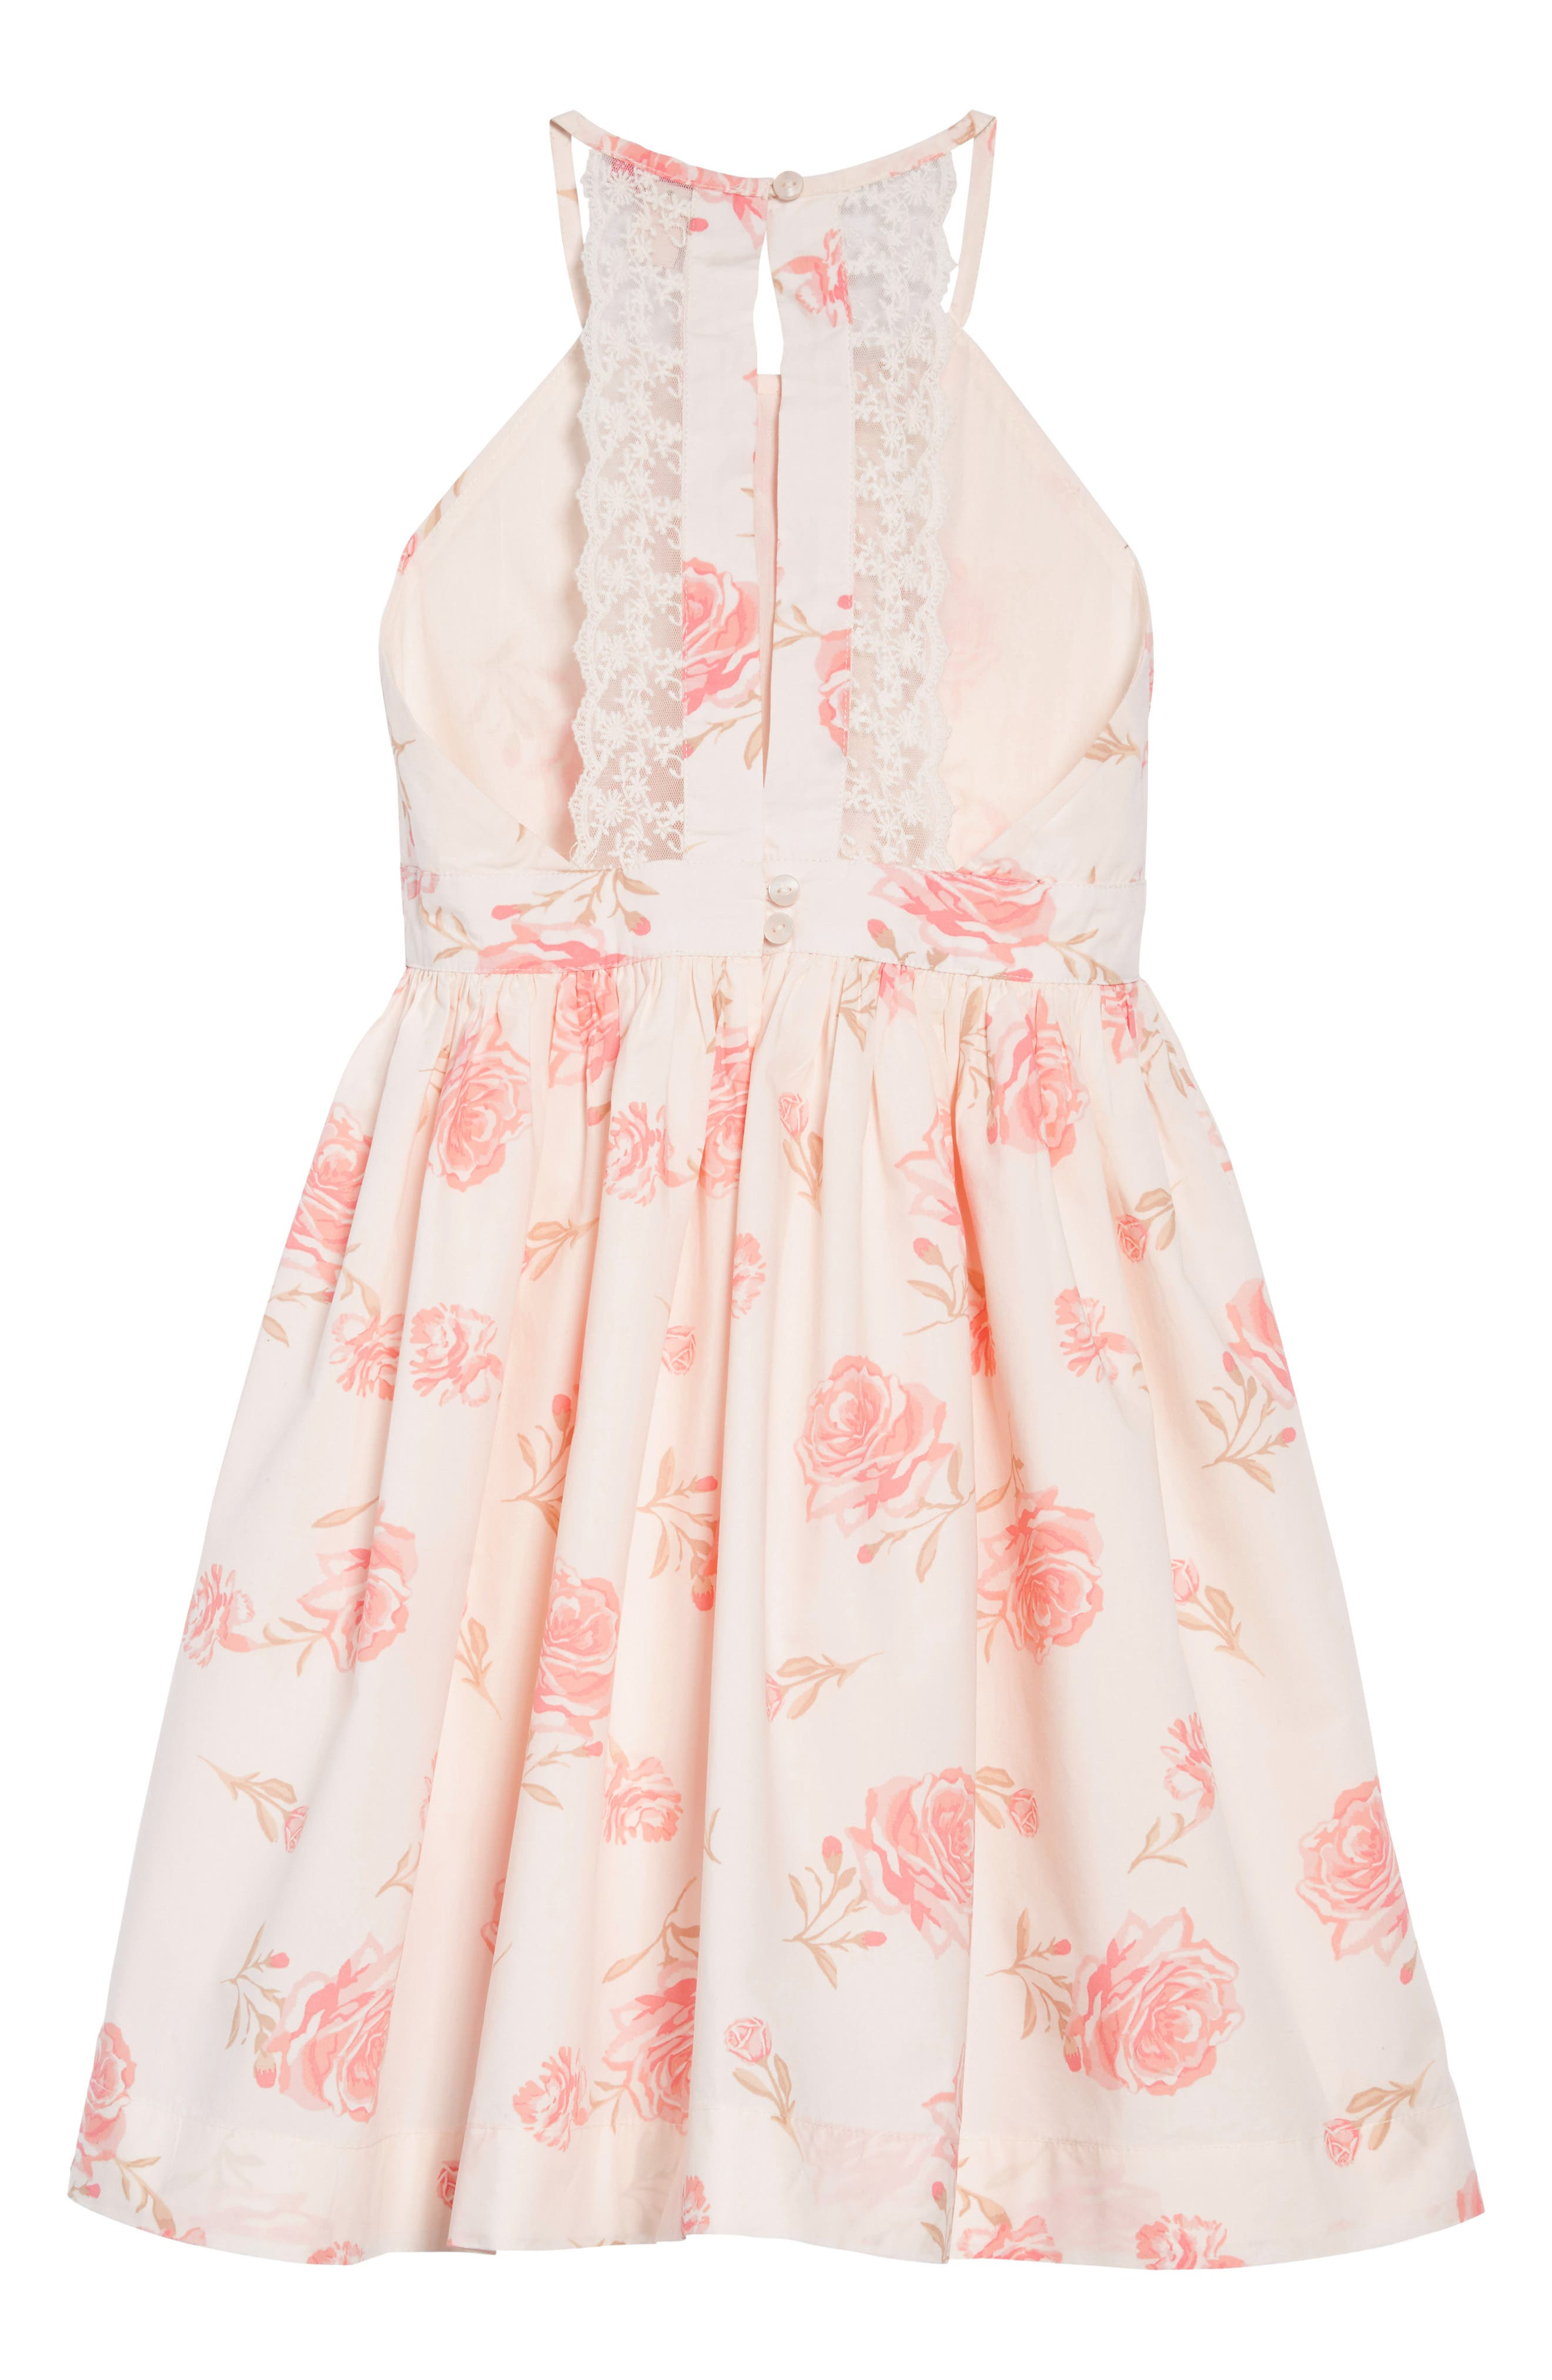 RUBY & BLOOM,                             Lovely Lace Dress,                             Alternate thumbnail 2, color,                             IVORY EGRET ELEGANT FLORAL